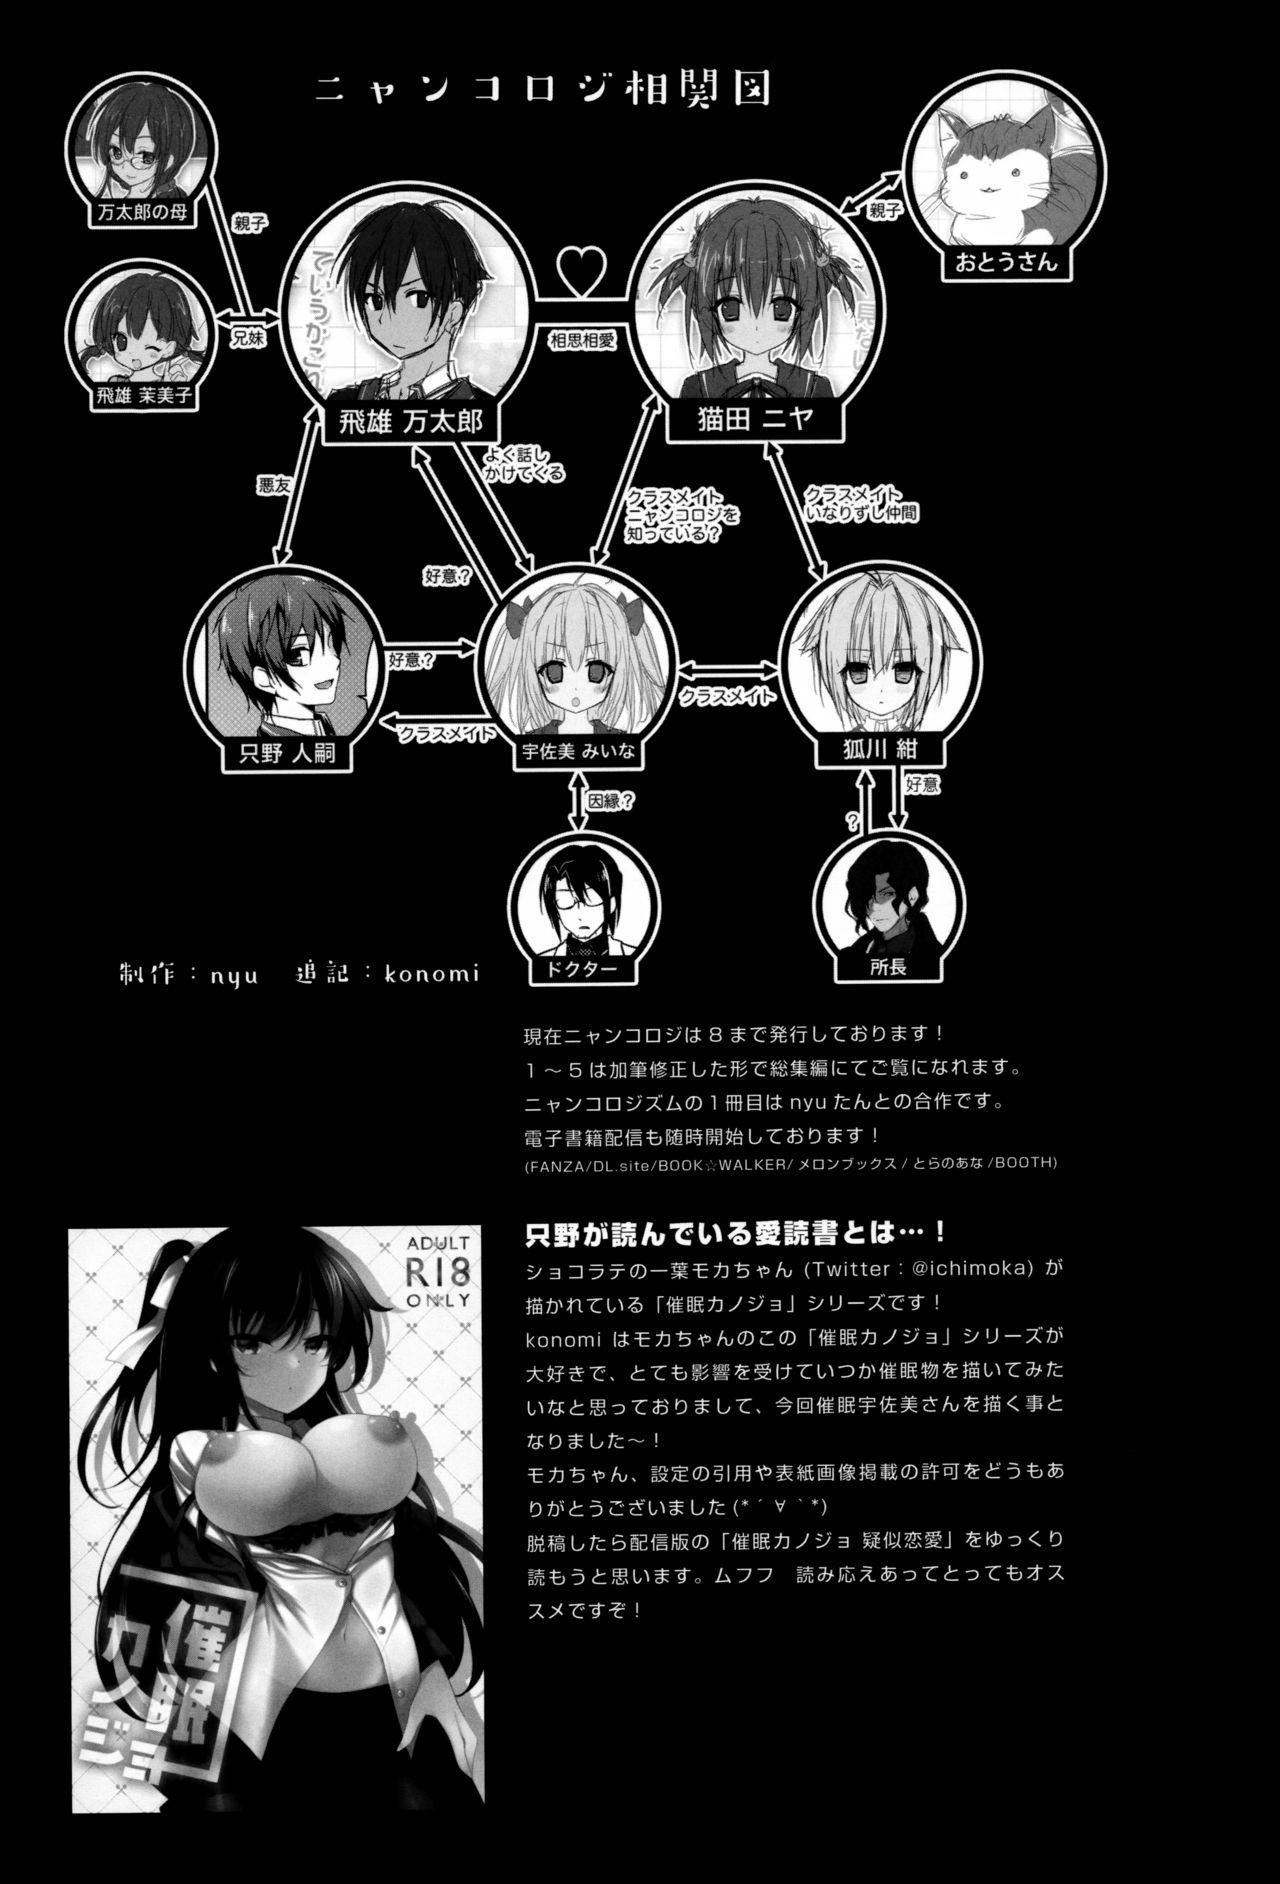 (C96) [Kinokonomi (konomi)] Saimin Usami-san -Nyancologism 2- 19